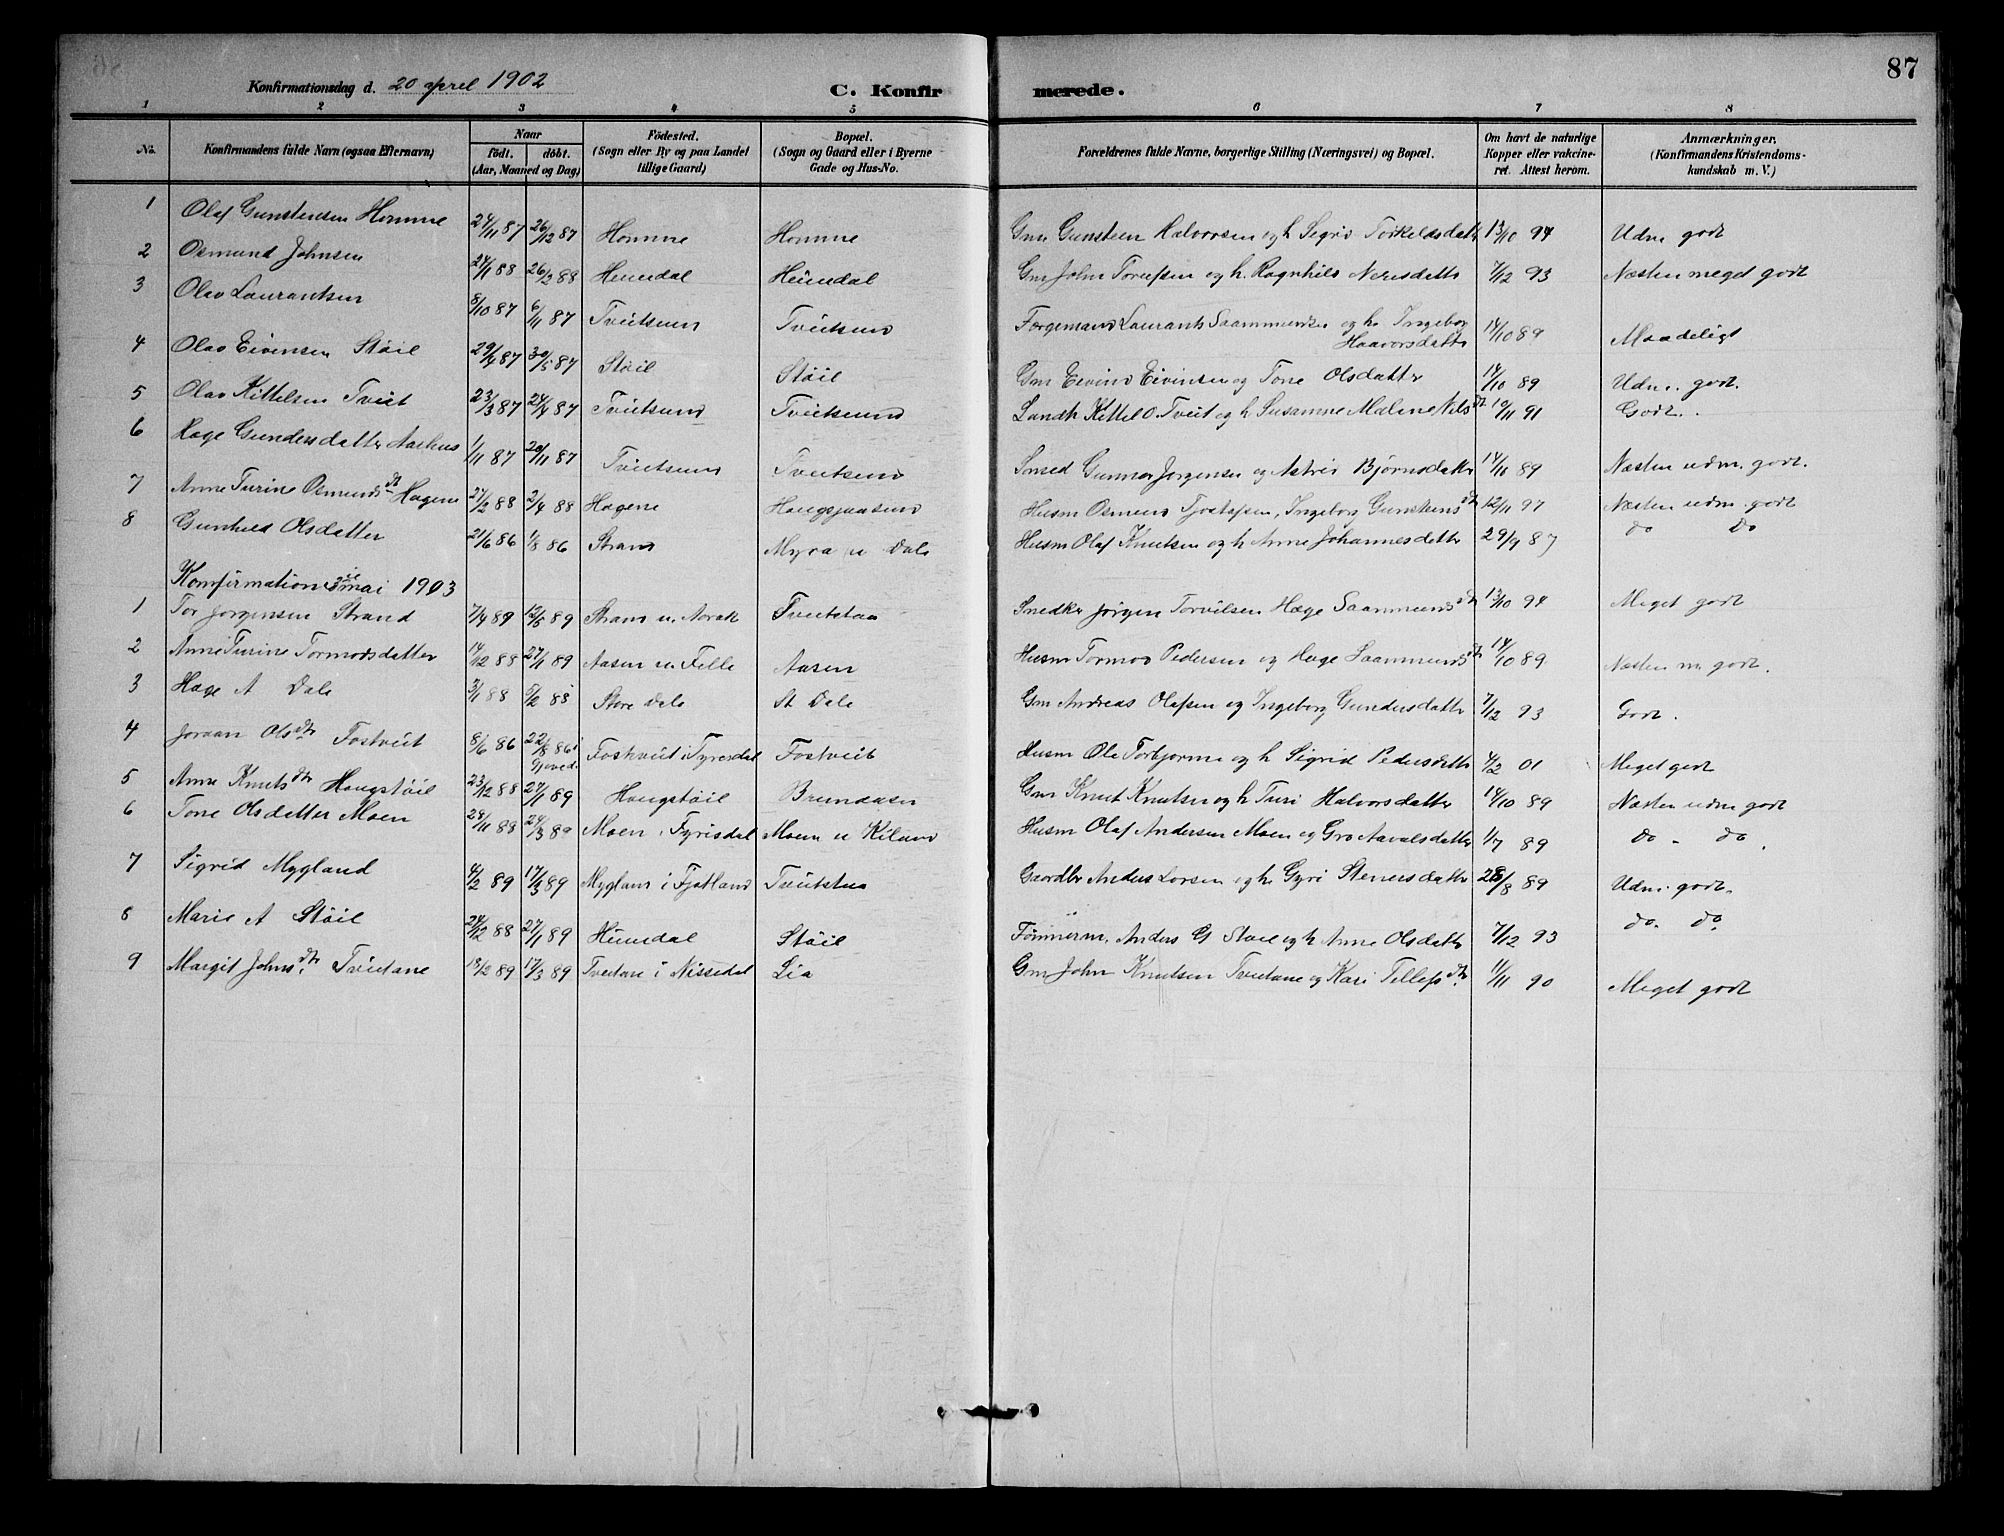 SAKO, Nissedal kirkebøker, G/Gb/L0003: Klokkerbok nr. II 3, 1893-1928, s. 87